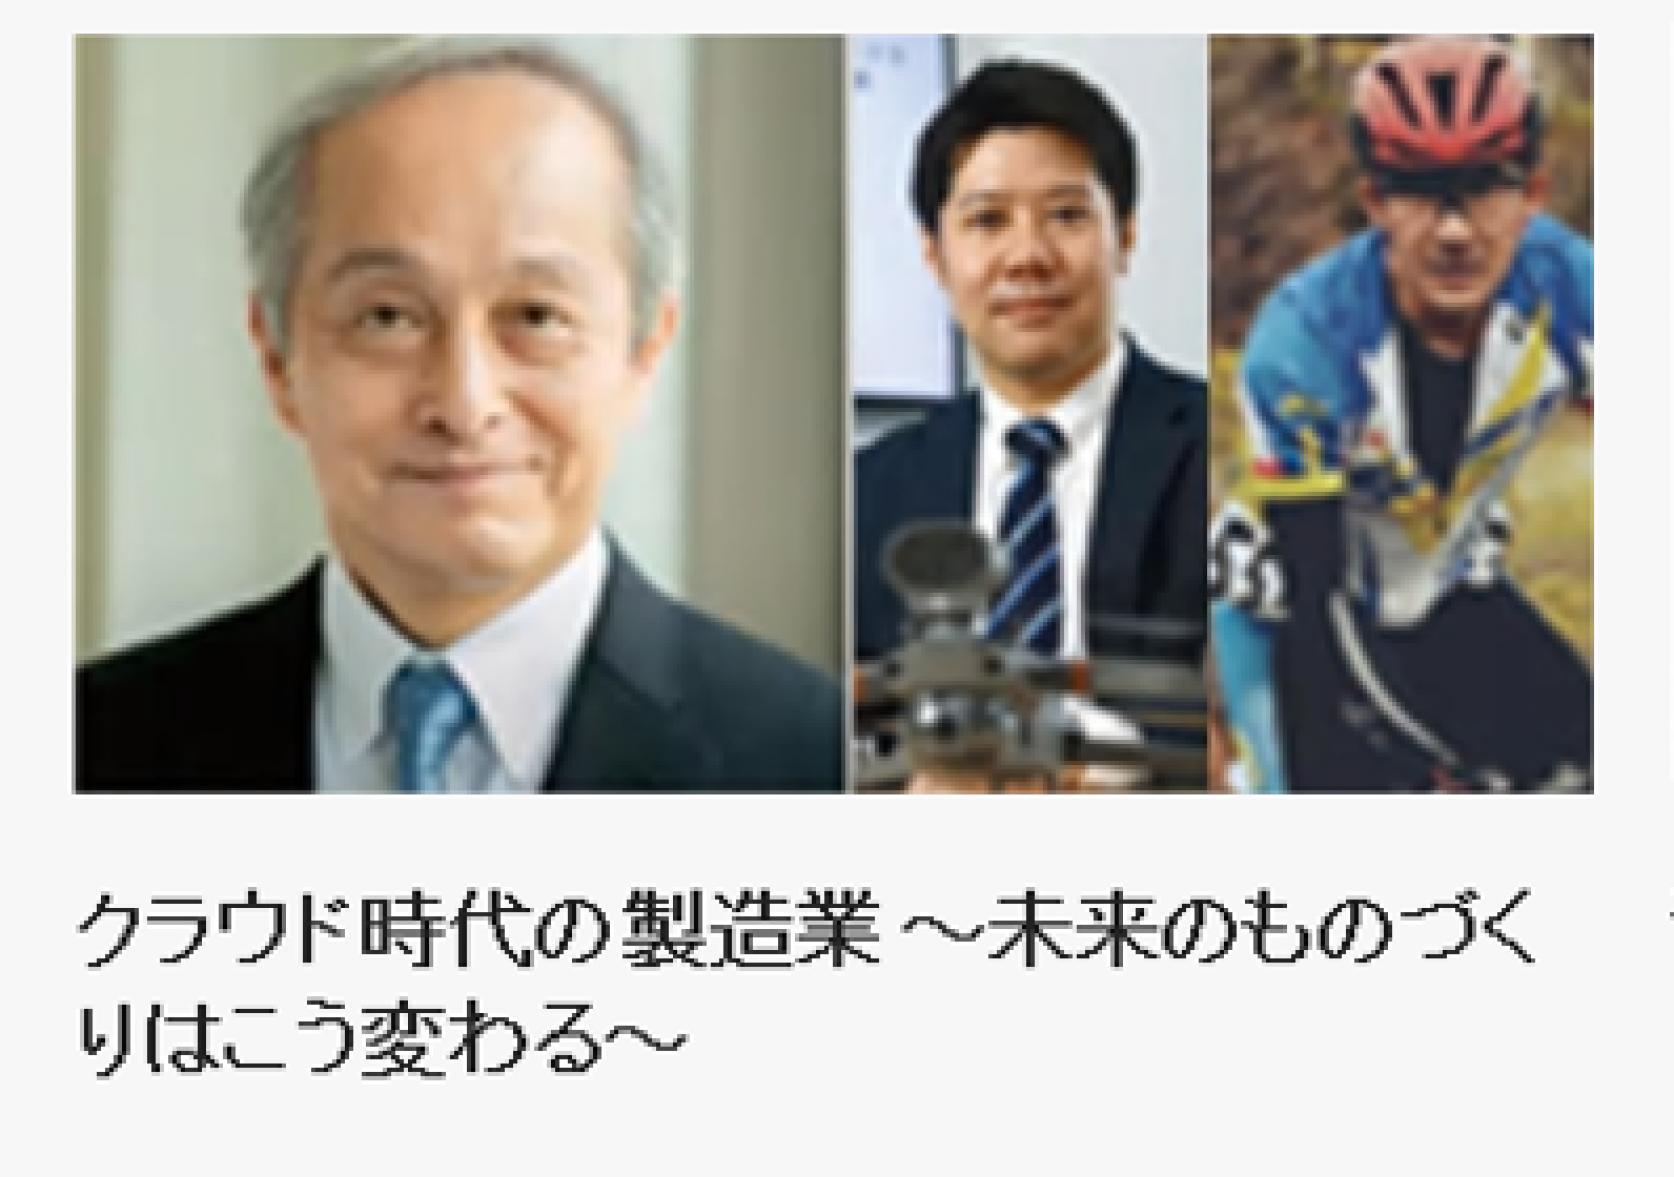 「Autodesk University 2020」(2020年11月18日-20日に開催)に、青木義男理工学部長をはじめ、精密機械工学科入江寿弘 教授、精密機械工学科の小池魁舟さん(専攻2年)、入江奏流さん(4年)、春田 隆佑さん(4年)らが、パネラーとして登場し、セッションを行います。